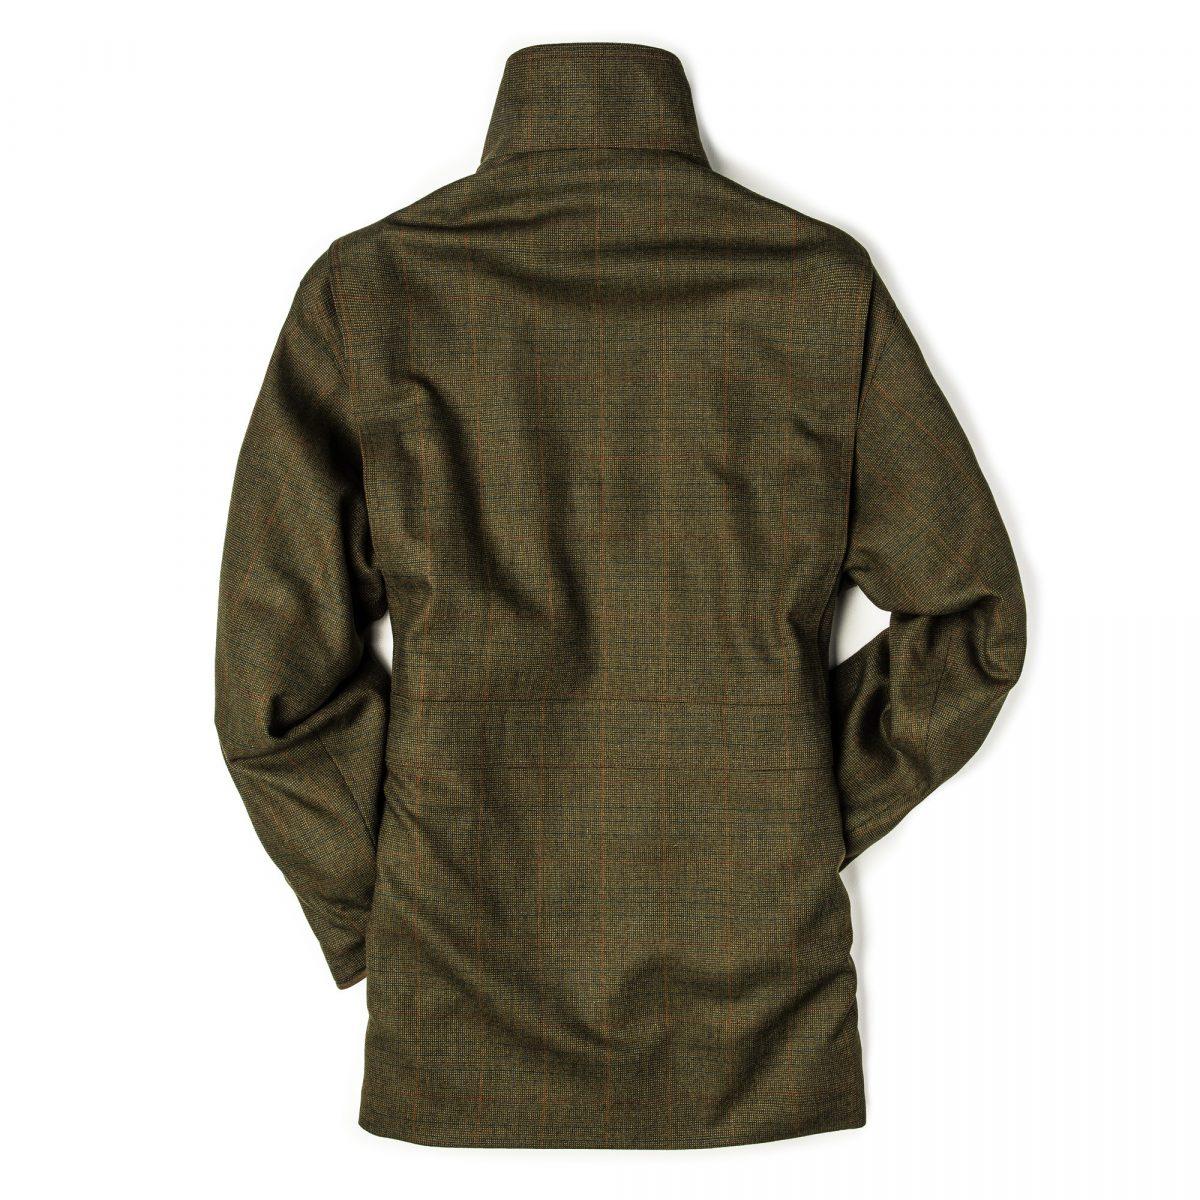 wr_co_tweed_shooting_jacket-8984-edit